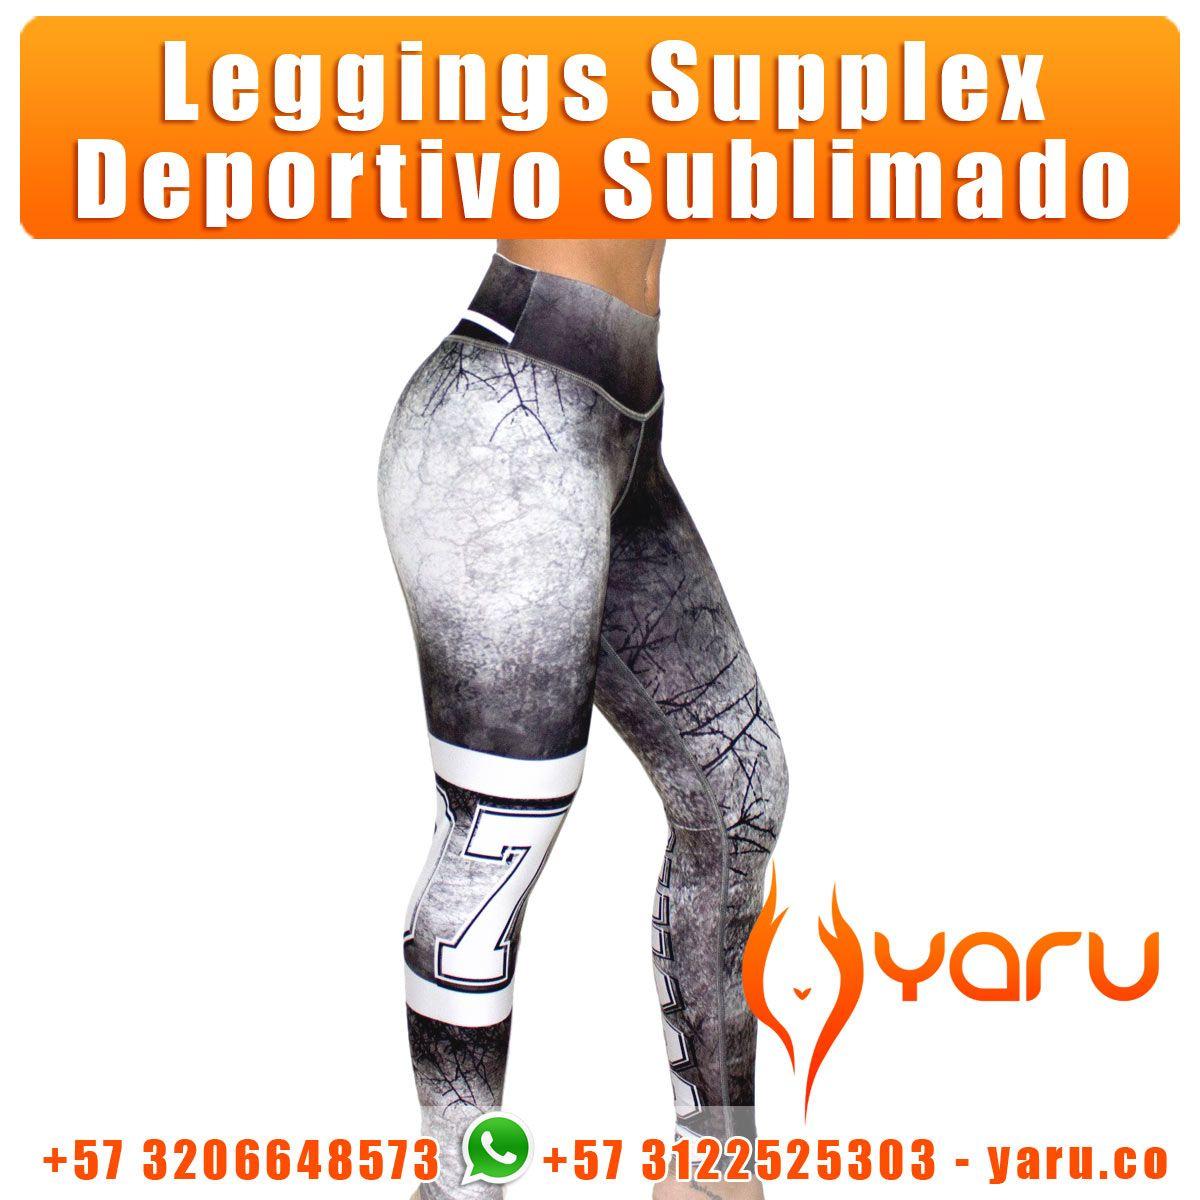 Yaru Fabrica Colombiana Ropa Deportiva Www Yaru Co Whatsapp 57 3122525303 Email Info Yaru Co Somos Una Empresa Que Fajas Colombianas Ropa Deportiva Deportes